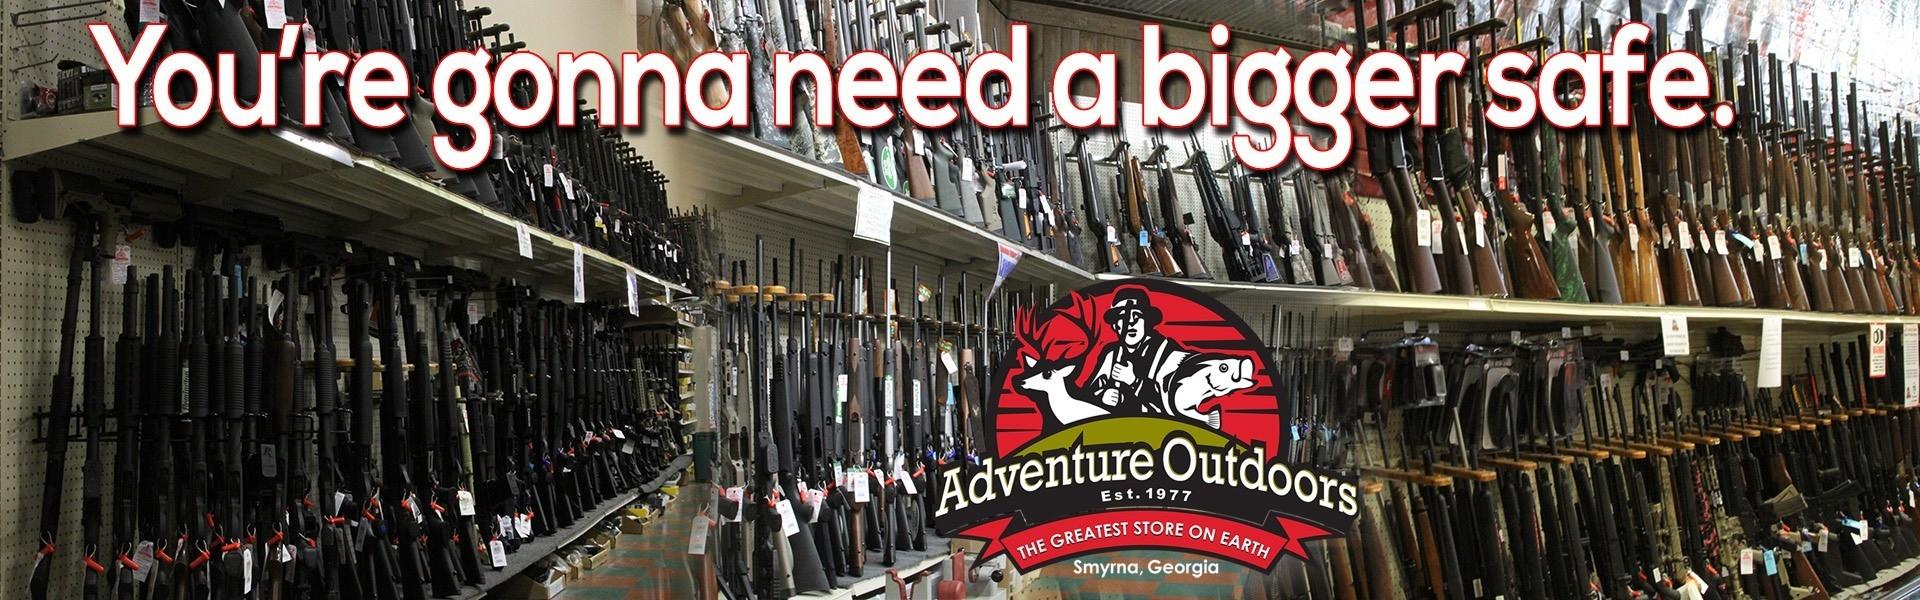 adventure outdoors deals